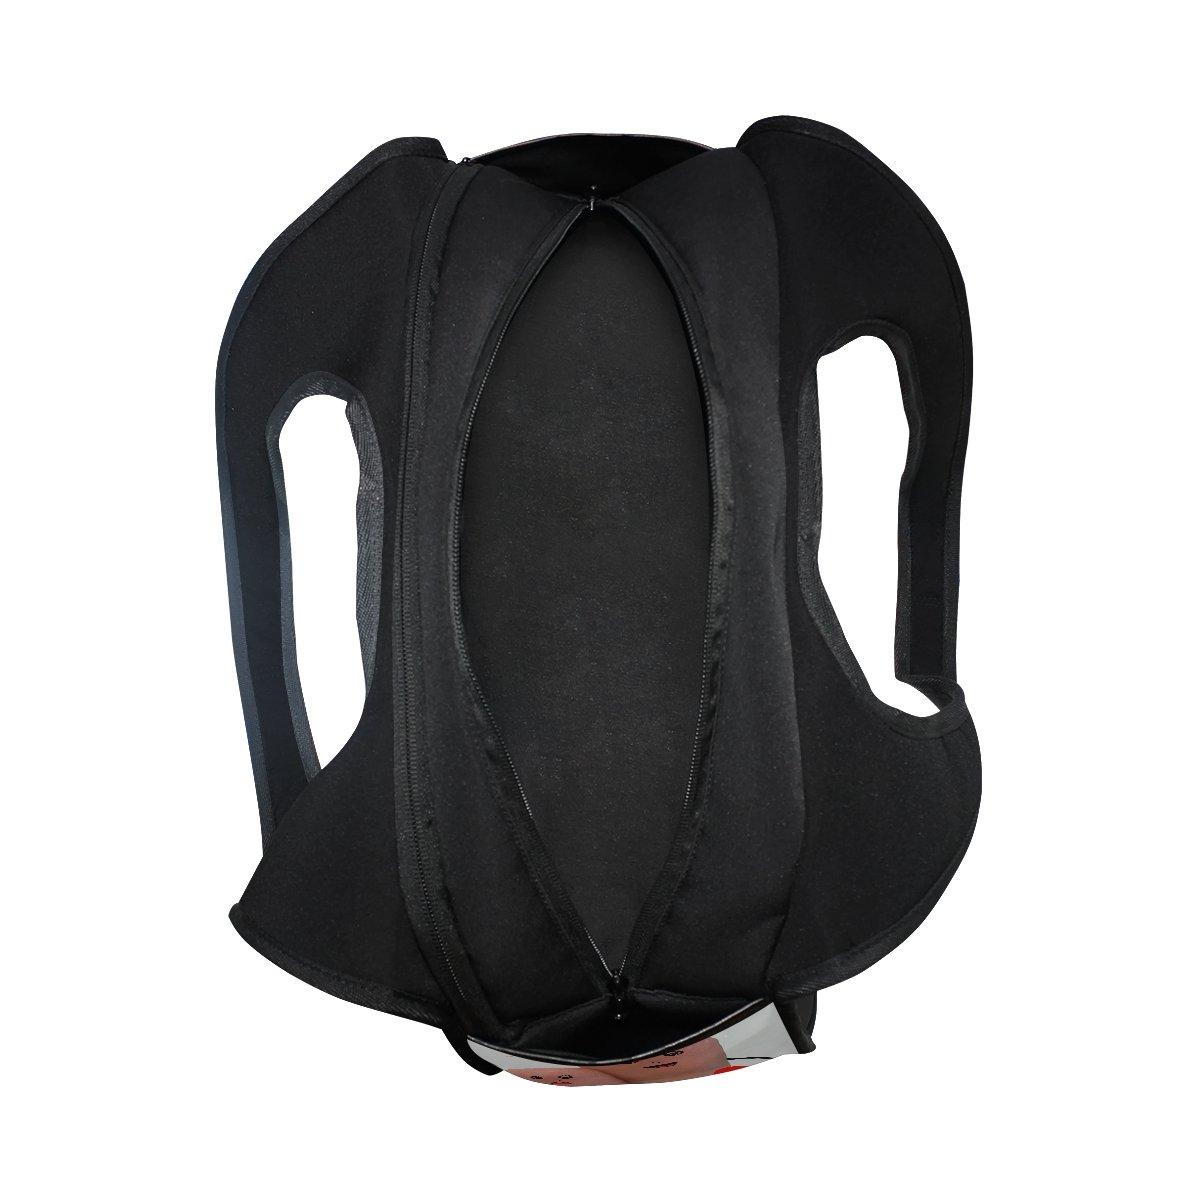 AHOMY Sports Gym Bag Love Marriage Duffel Bag Travel Shoulder Bag by AHOMY (Image #5)